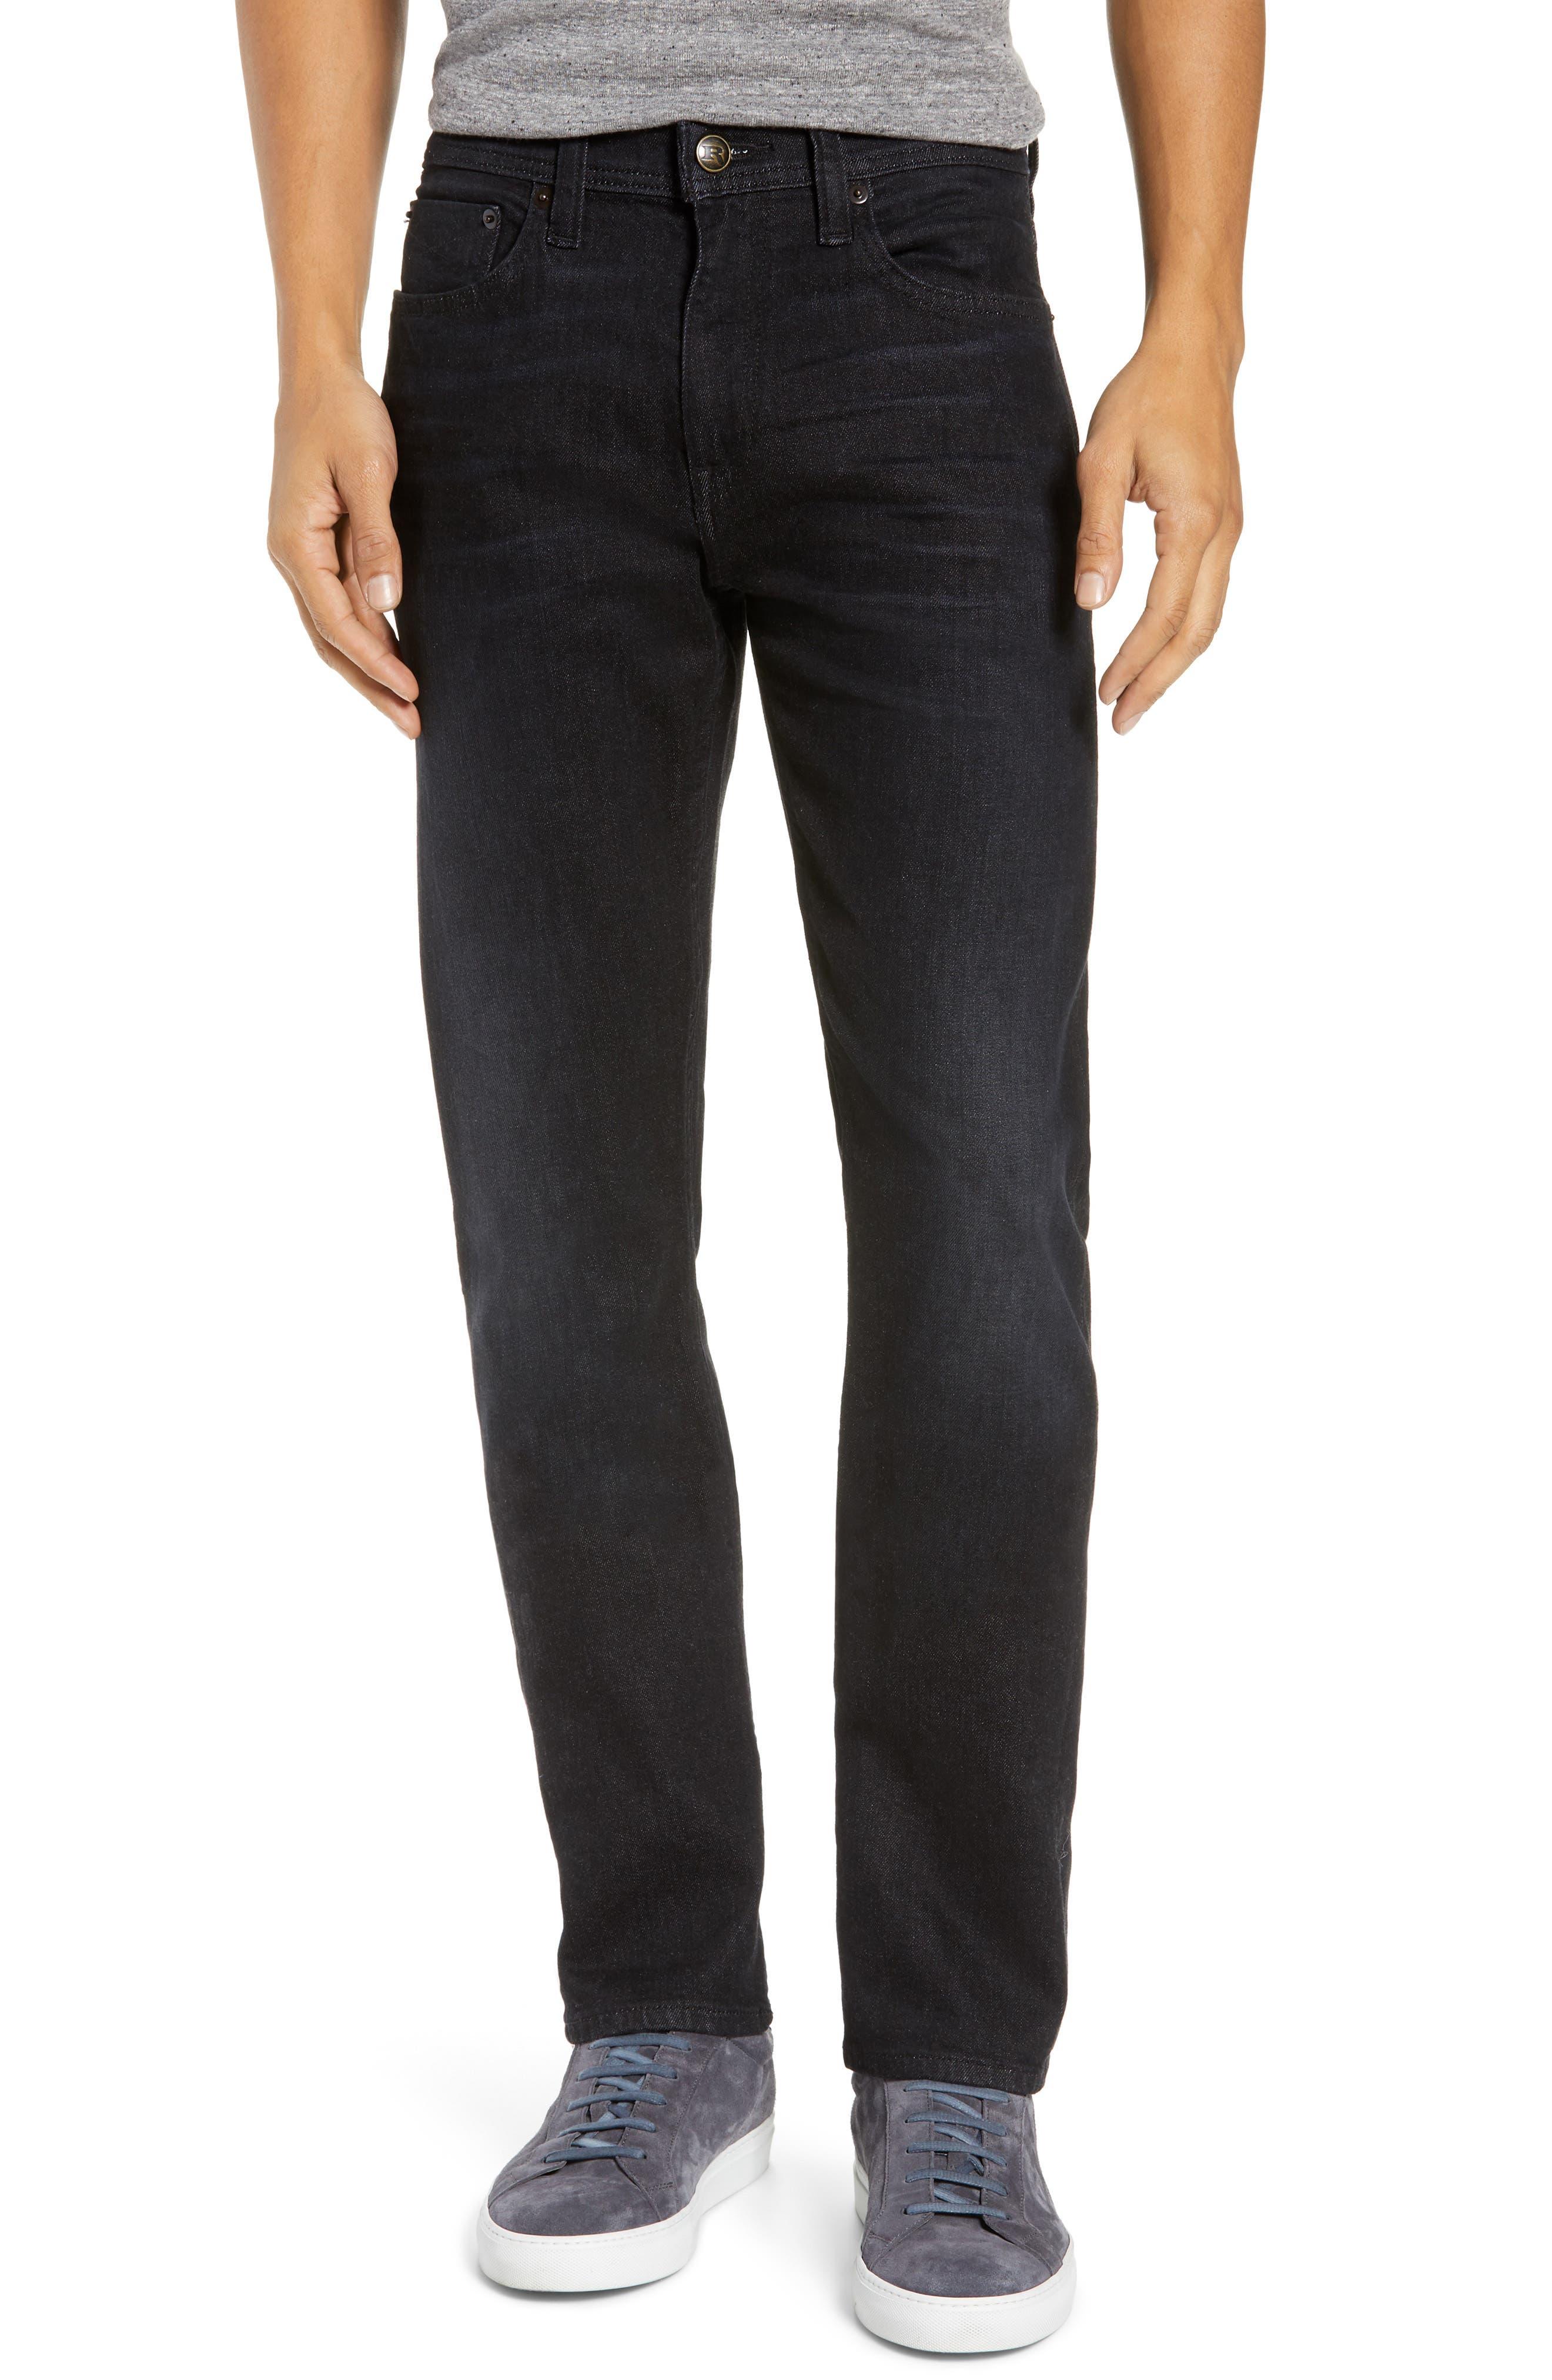 REVTOWN,                             Sharp Slim Fit Jeans,                             Main thumbnail 1, color,                             COAL BLACK